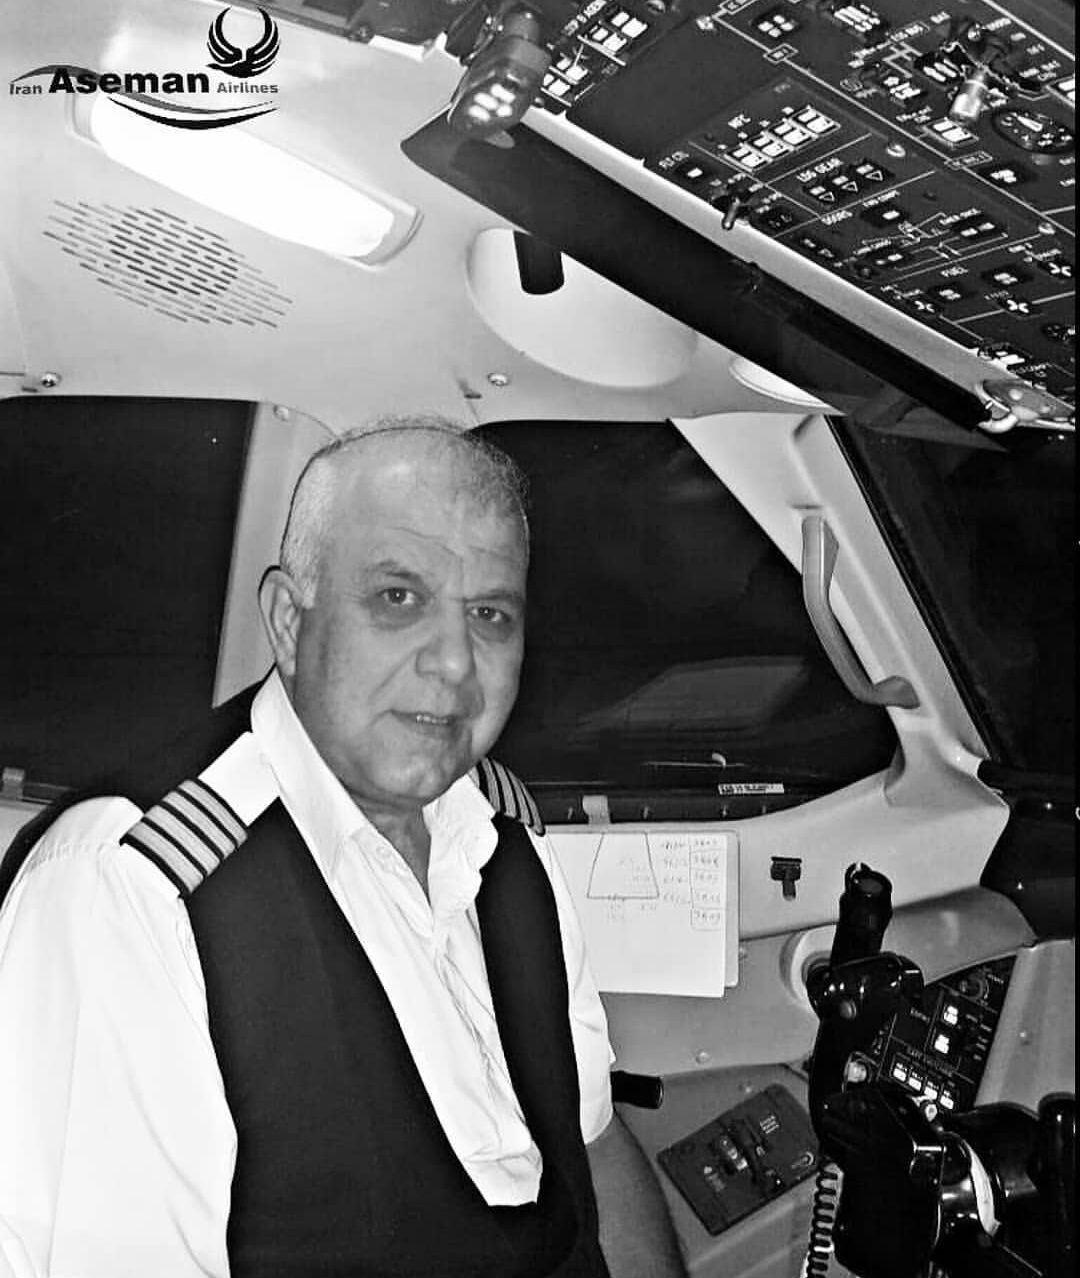 asemam航空官方Instagram帐号发布的失事客机机长照片